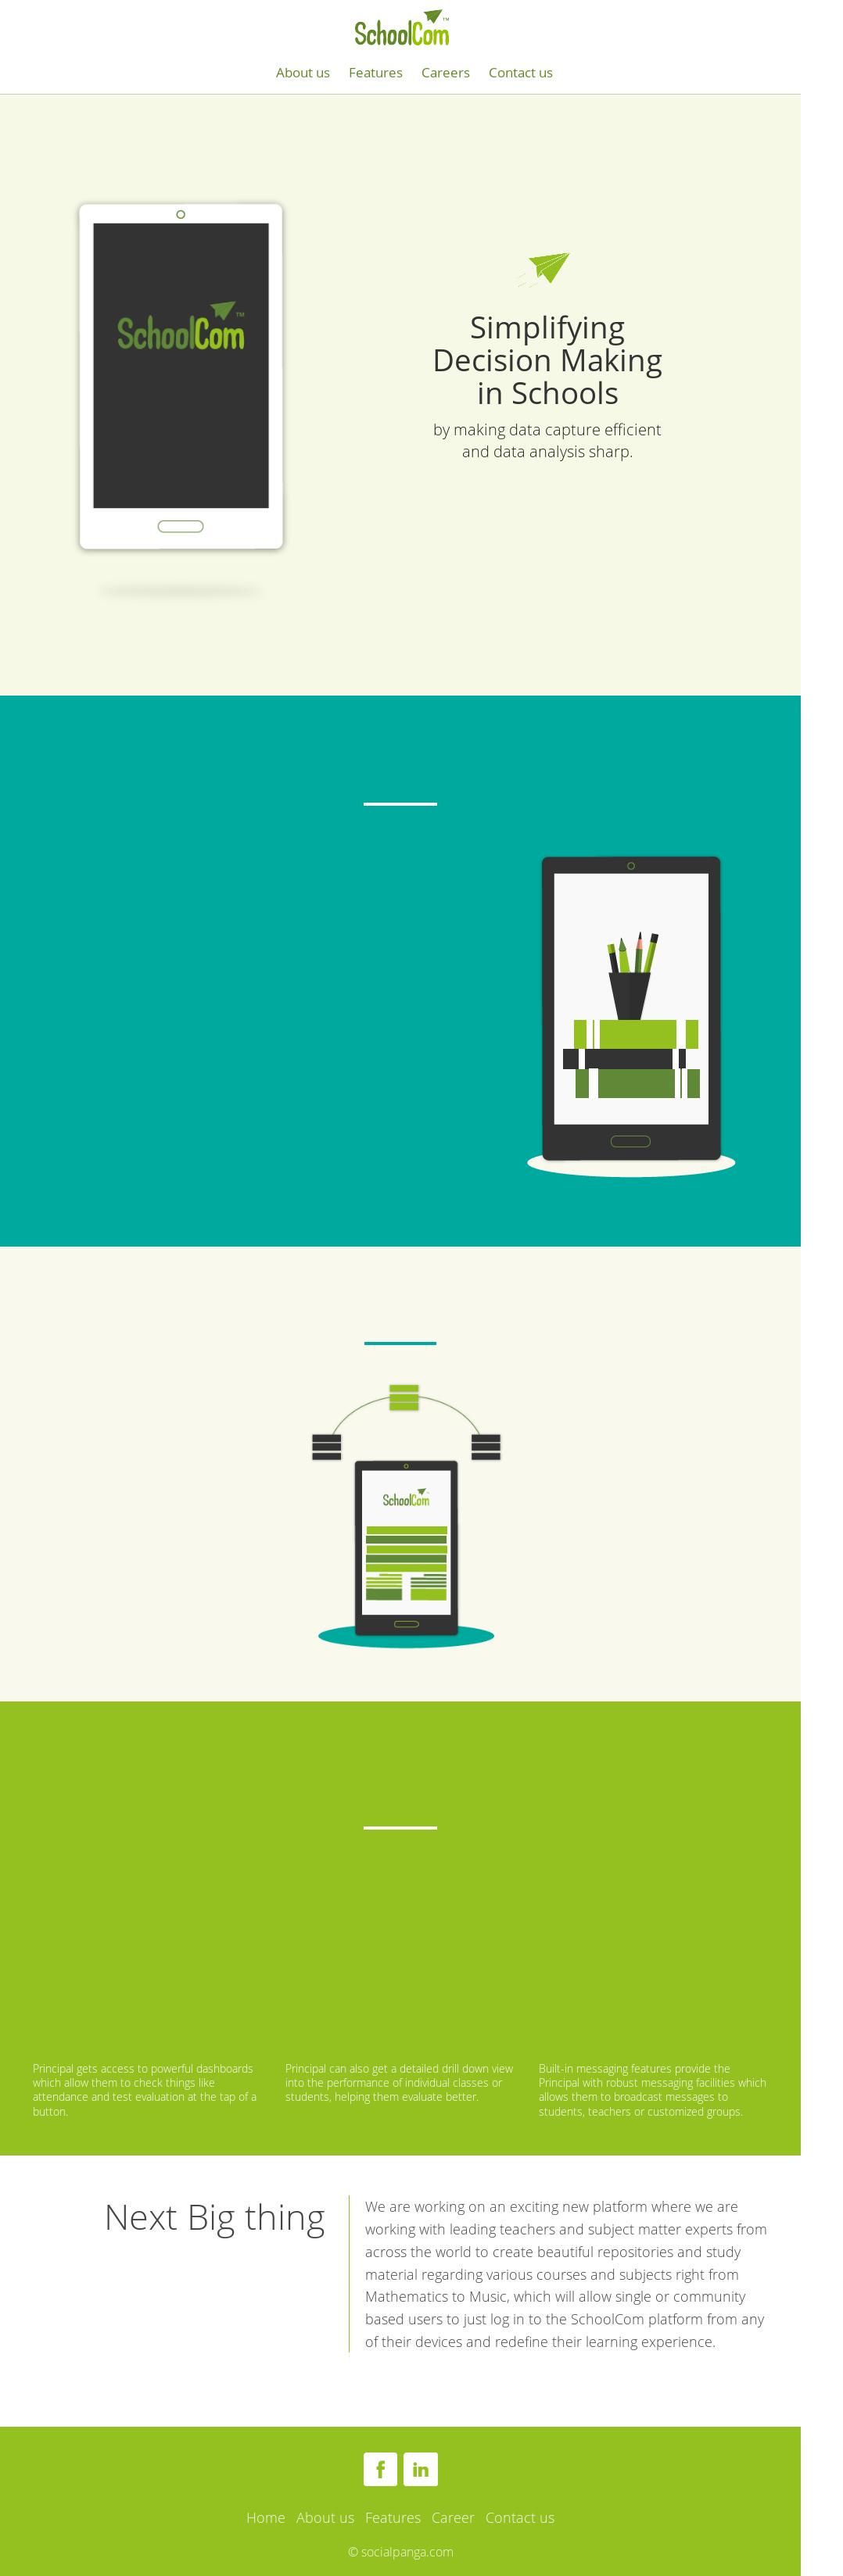 SchoolCom Competitors, Revenue and Employees - Owler Company Profile